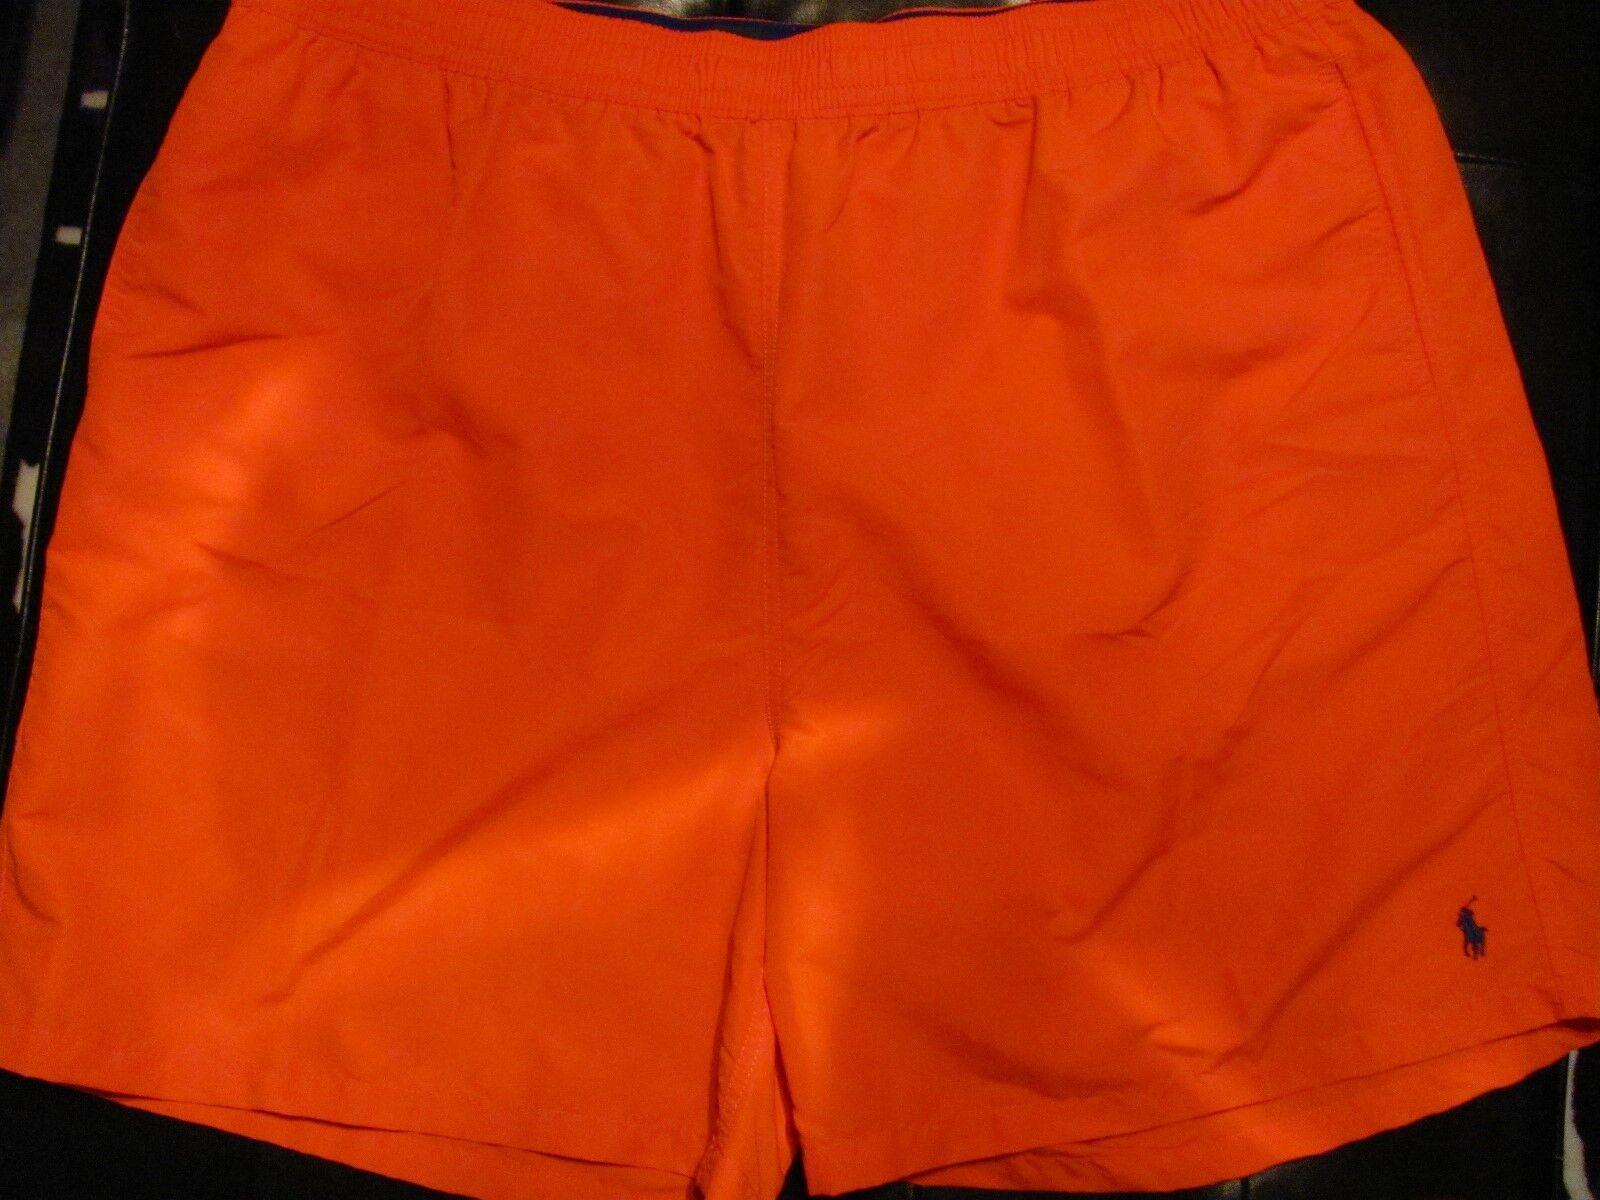 NEW 4XT 4XL TALL 4XT Ralph Lauren POLO Swimsuit orange w NAVY blueE PONY